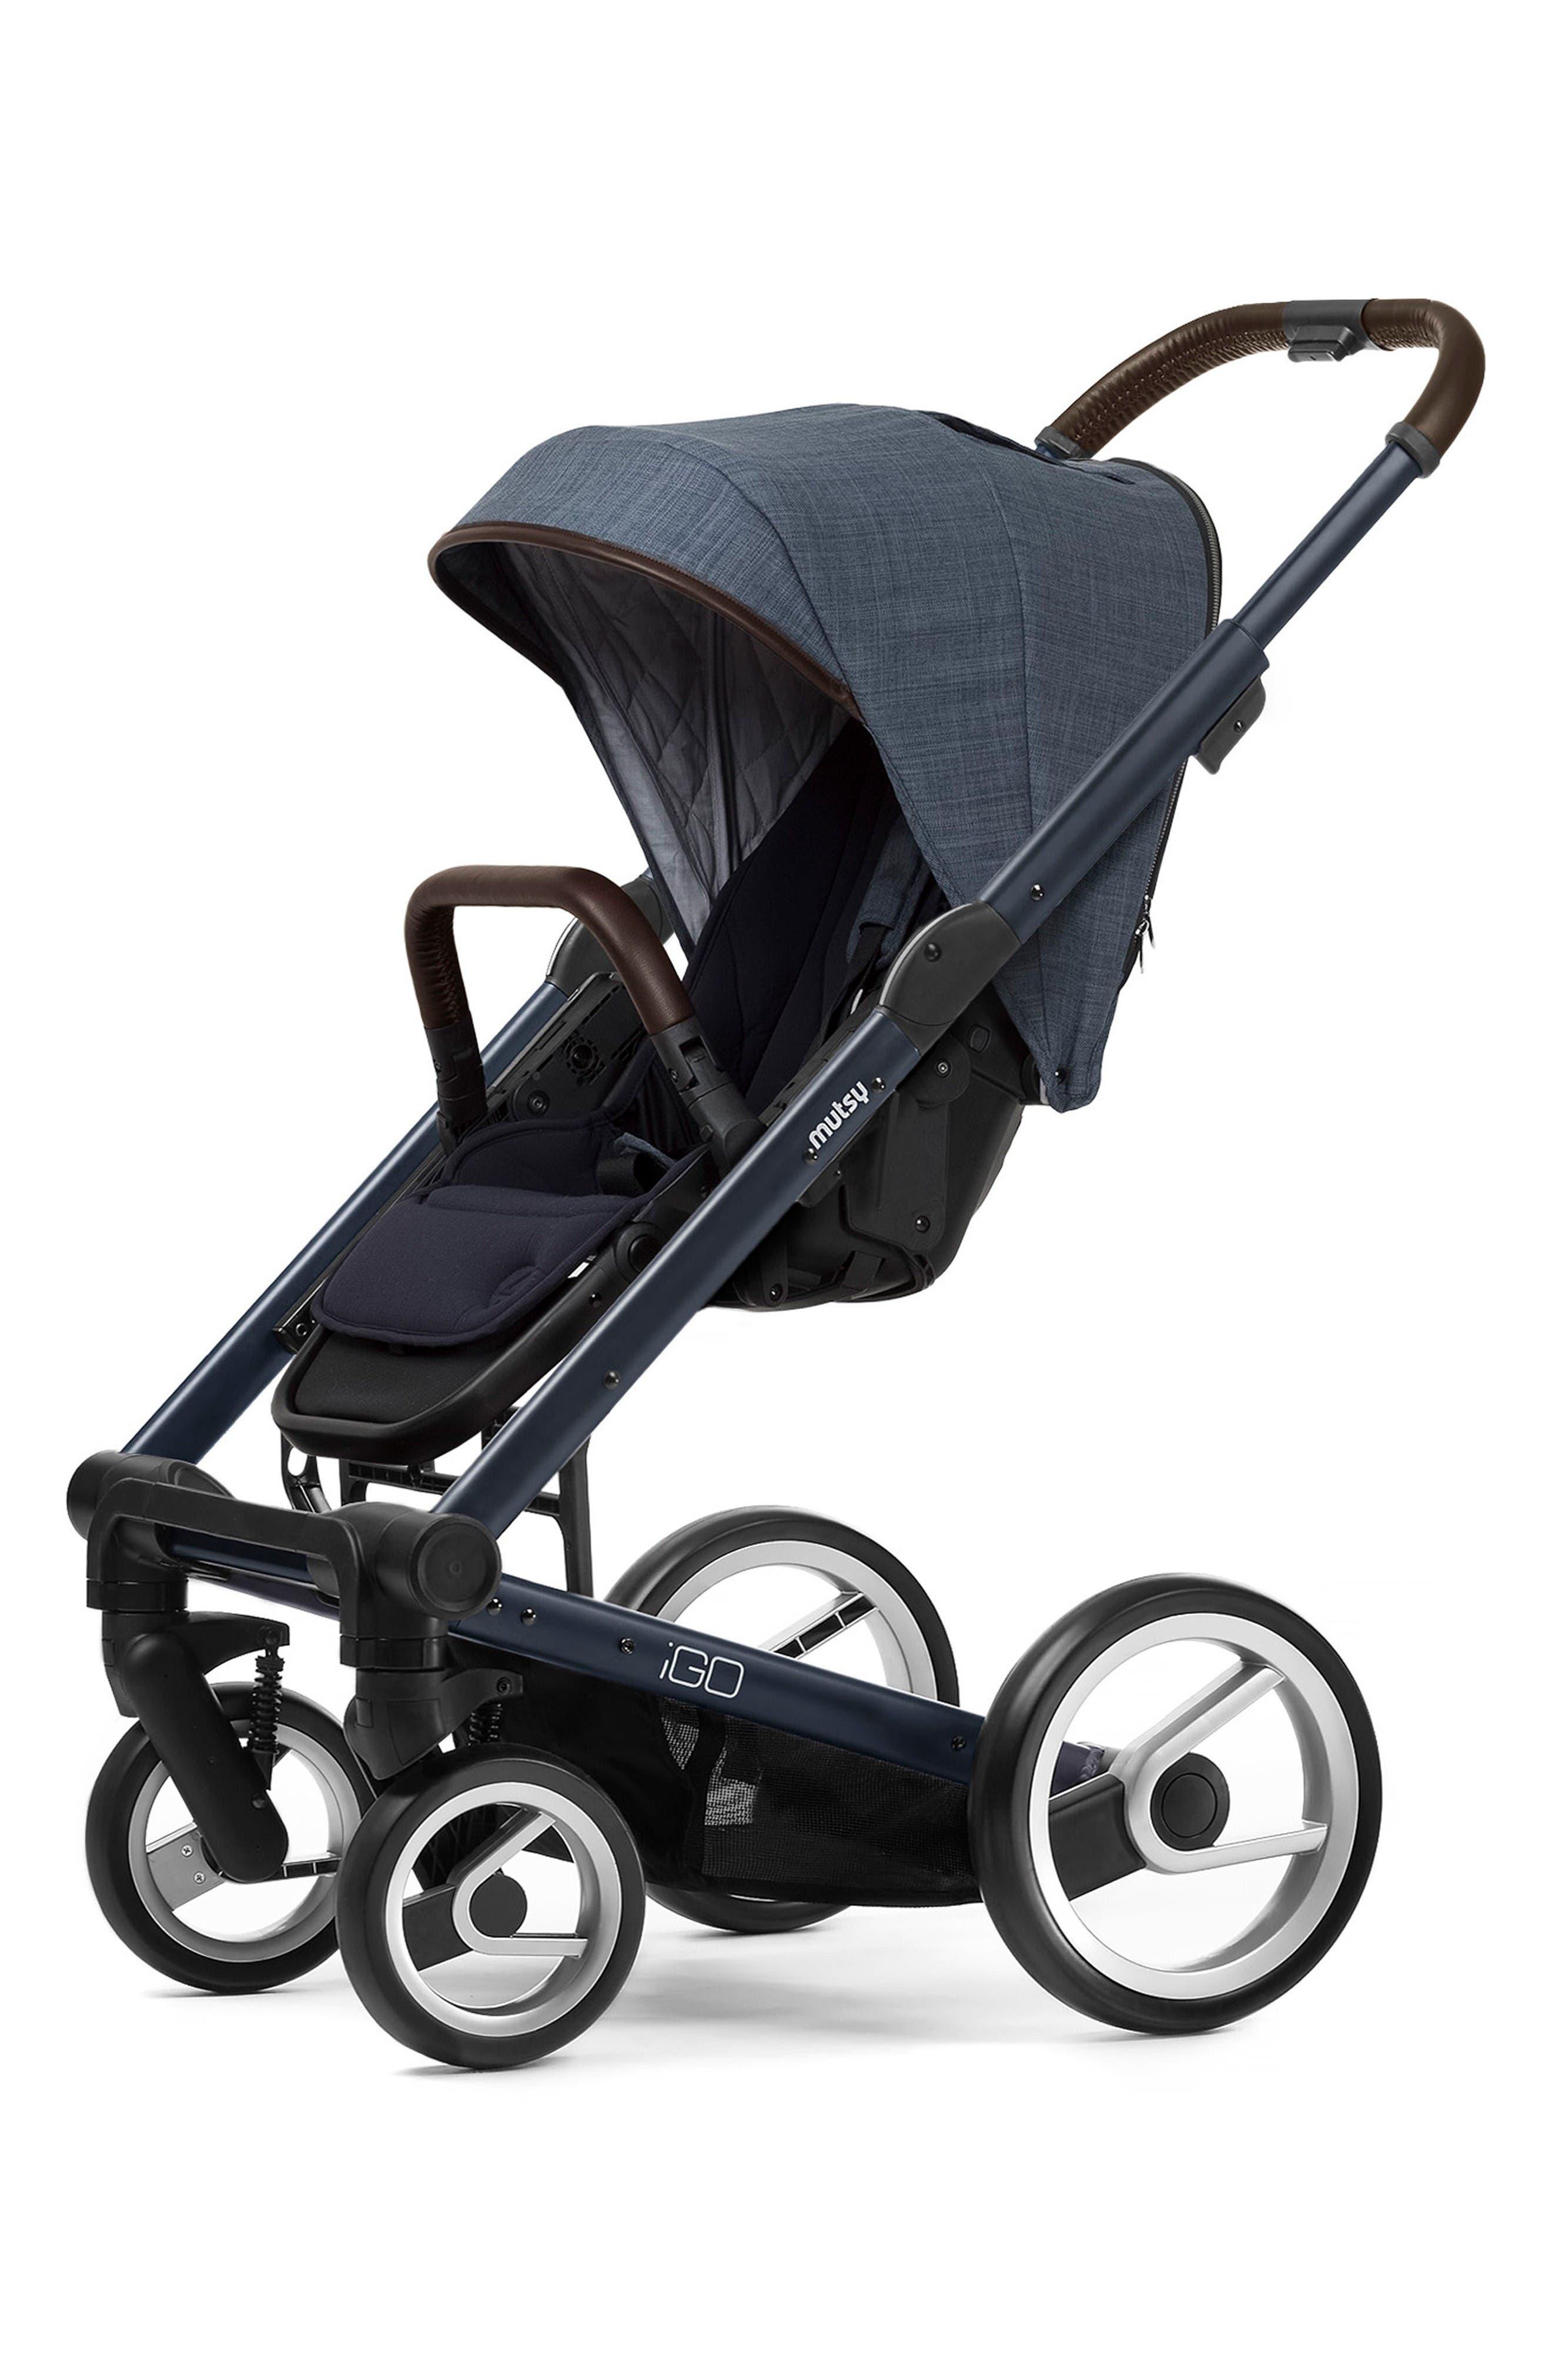 Main Image - Mutsy Igo - Farmer Earth Stroller